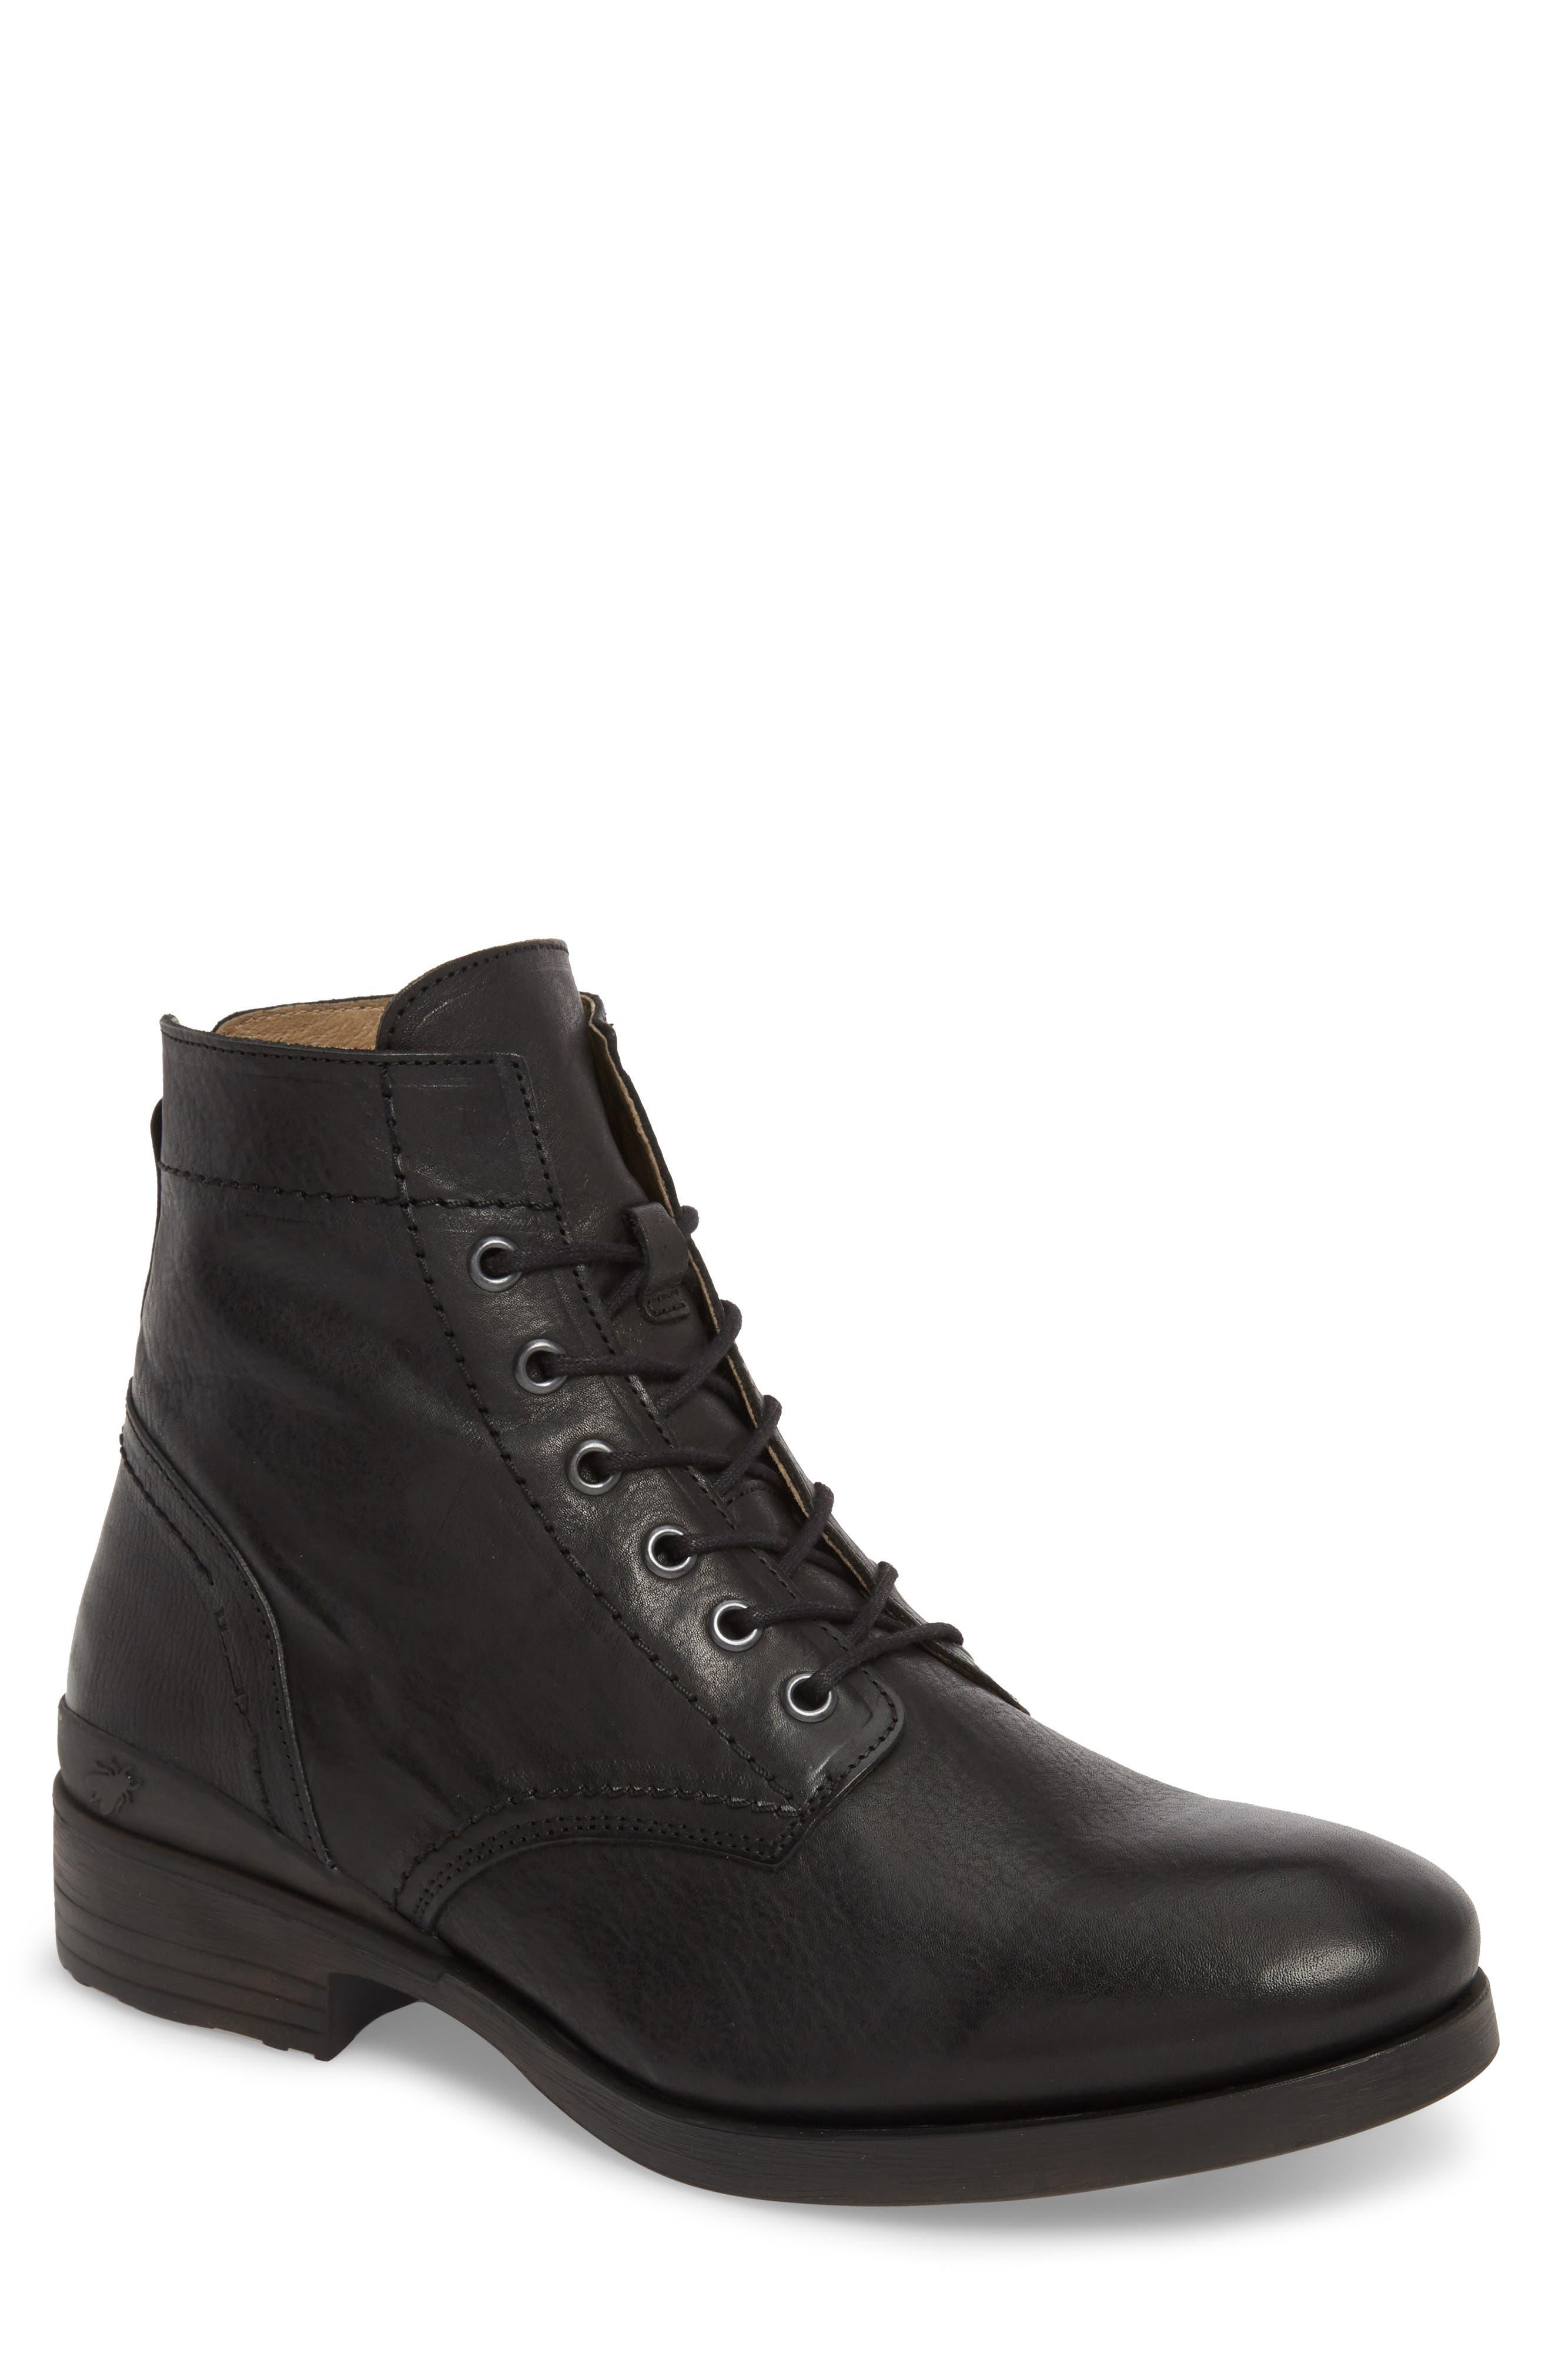 Fly London Marc Combat Boot, Black